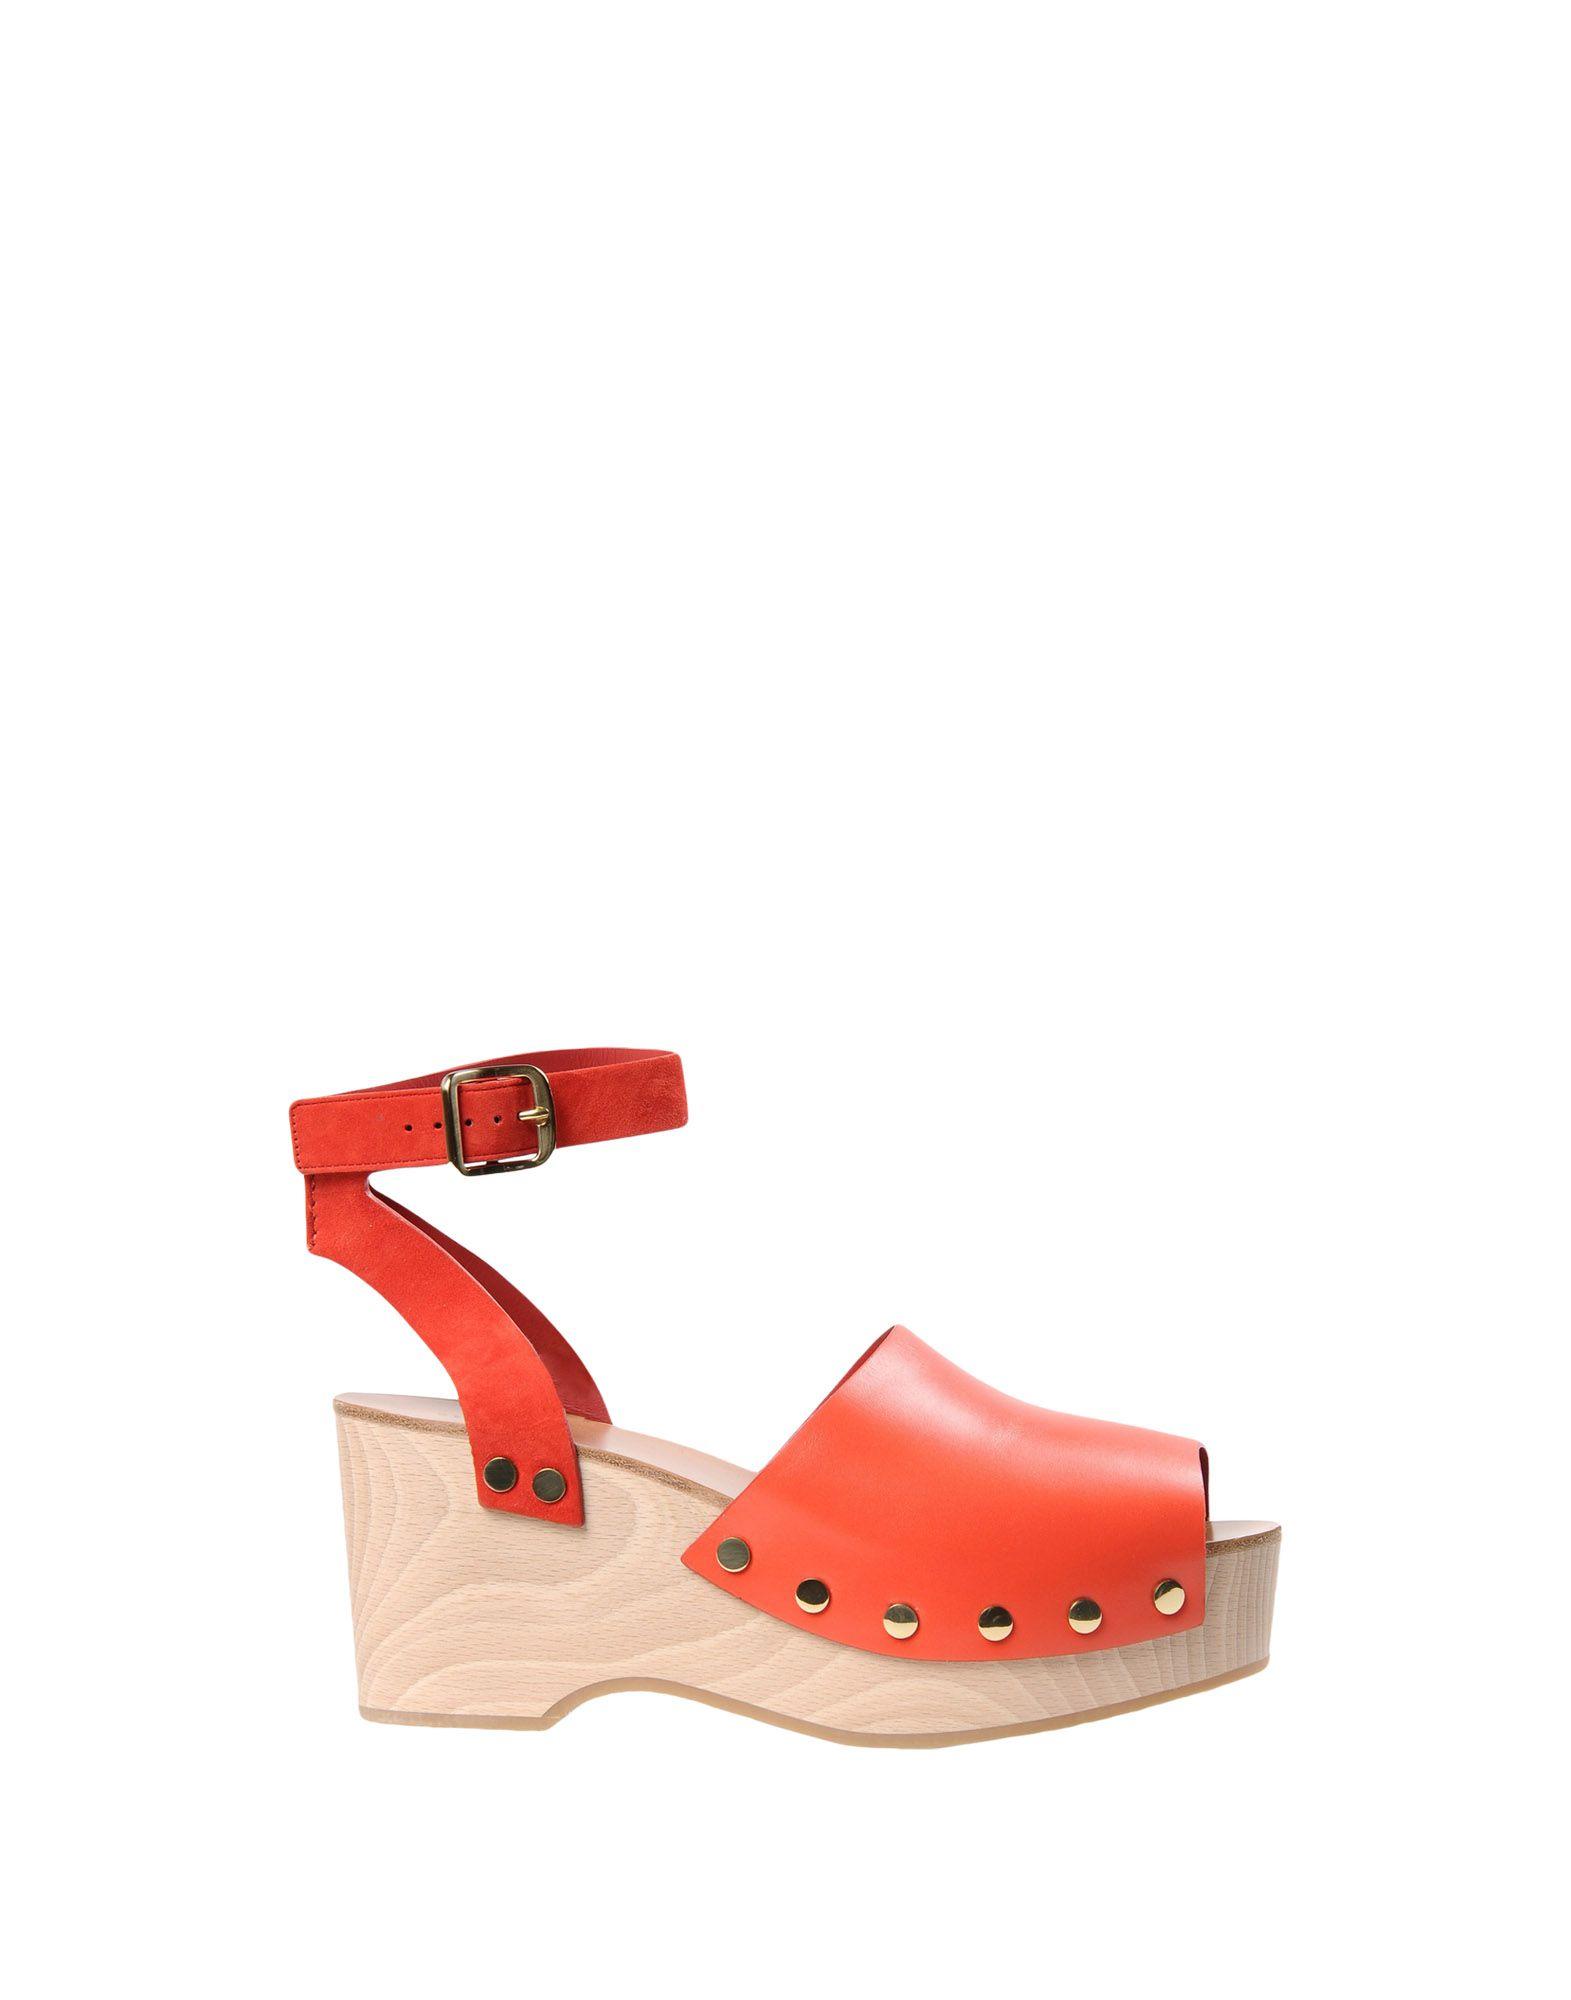 Céline Sandalen Schuhe Damen  11330452SR Heiße Schuhe Sandalen 953059